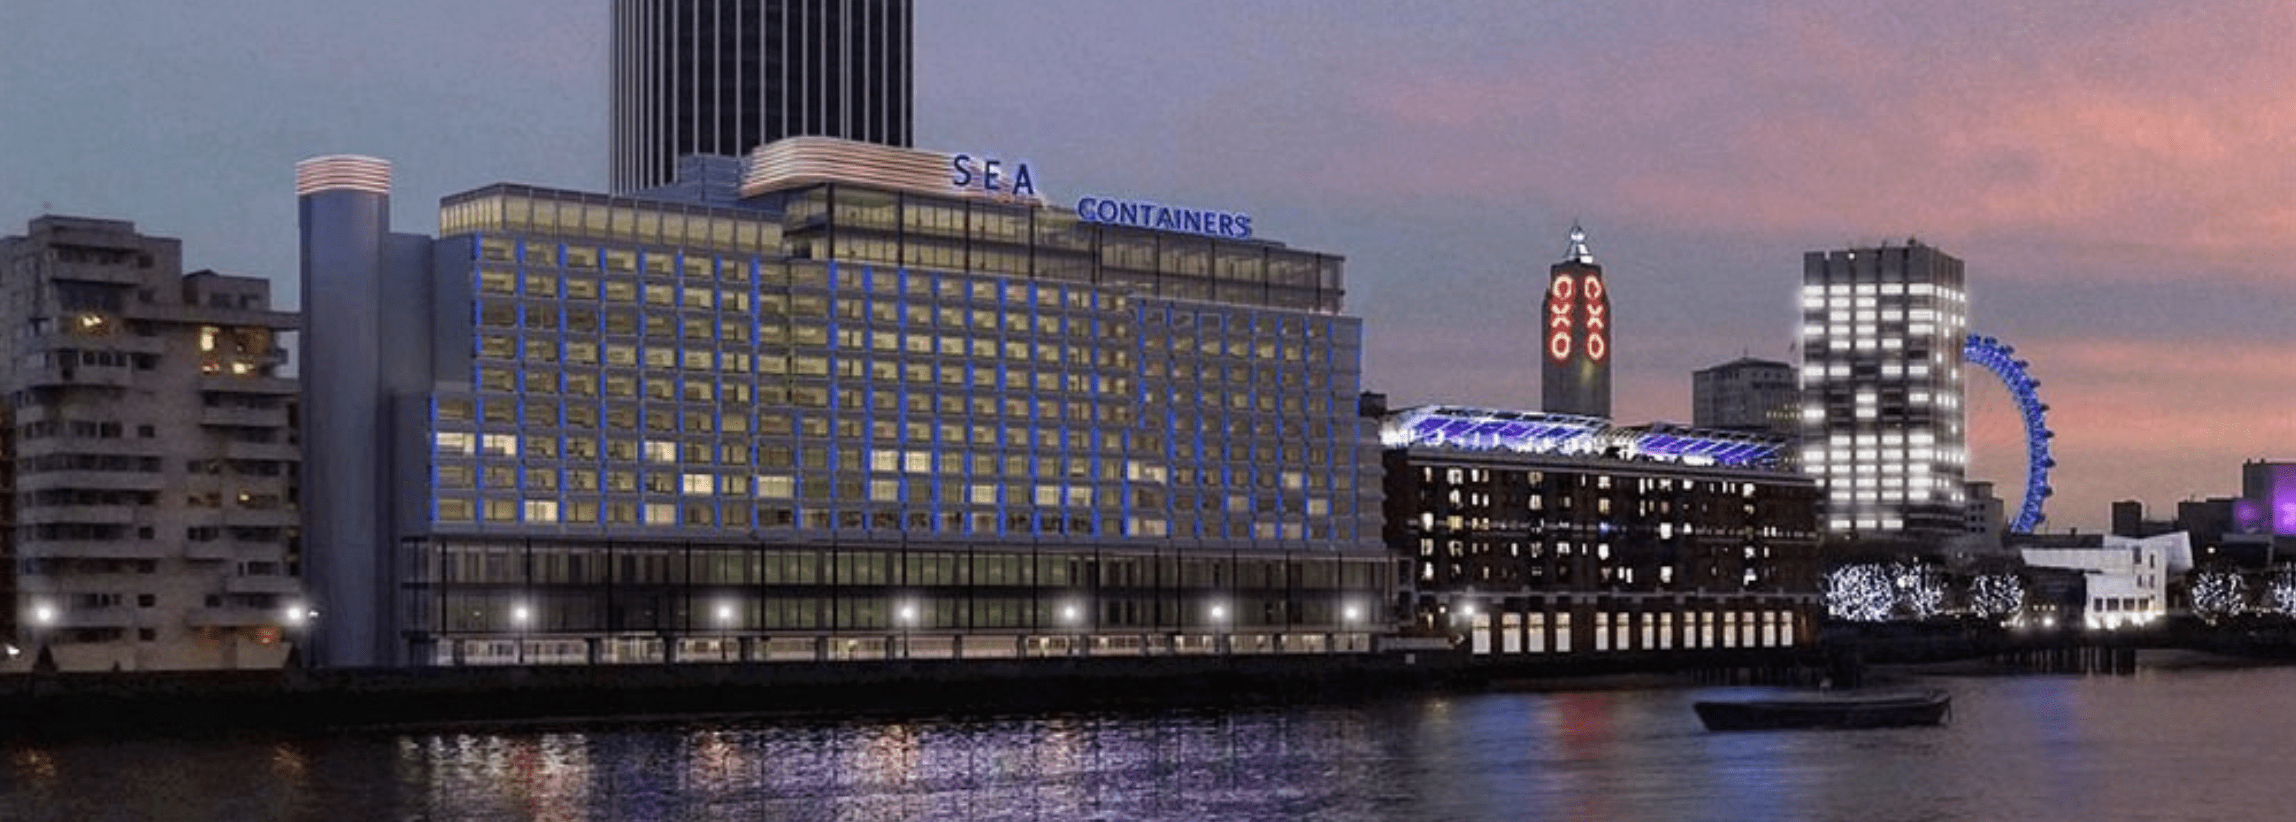 sea containers hotel sur la tamise